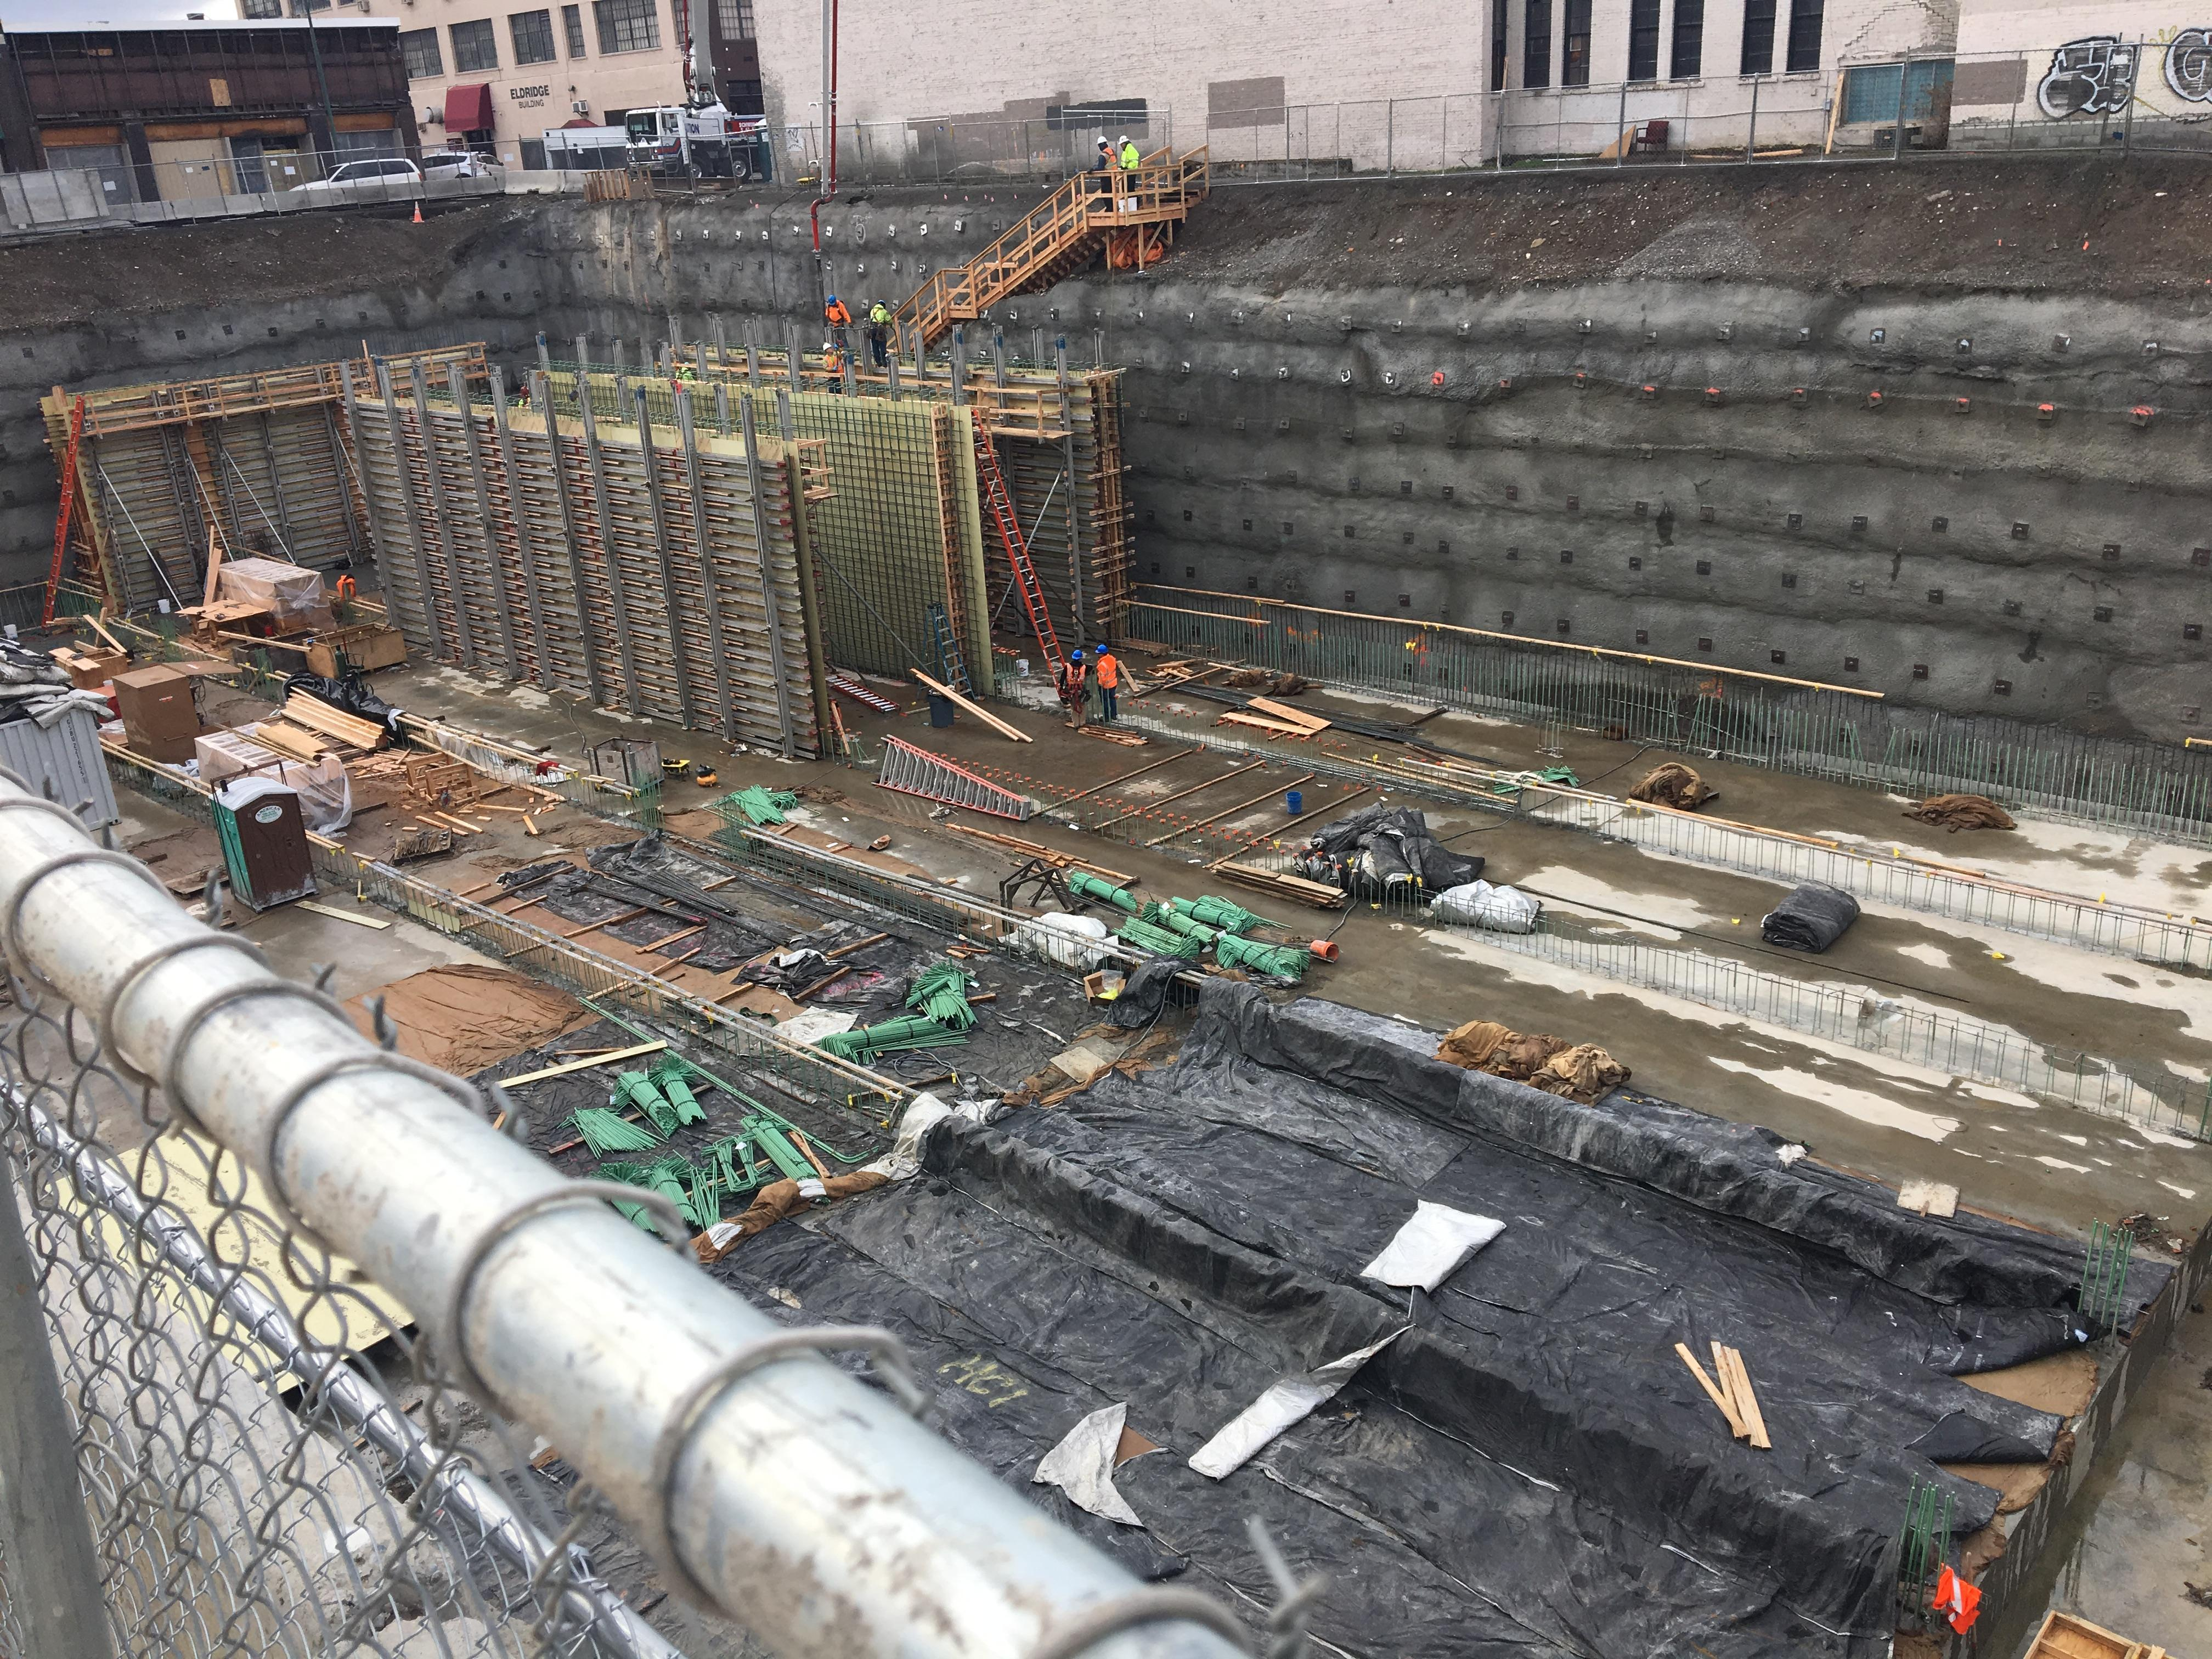 sewer hookup spokane valley wa